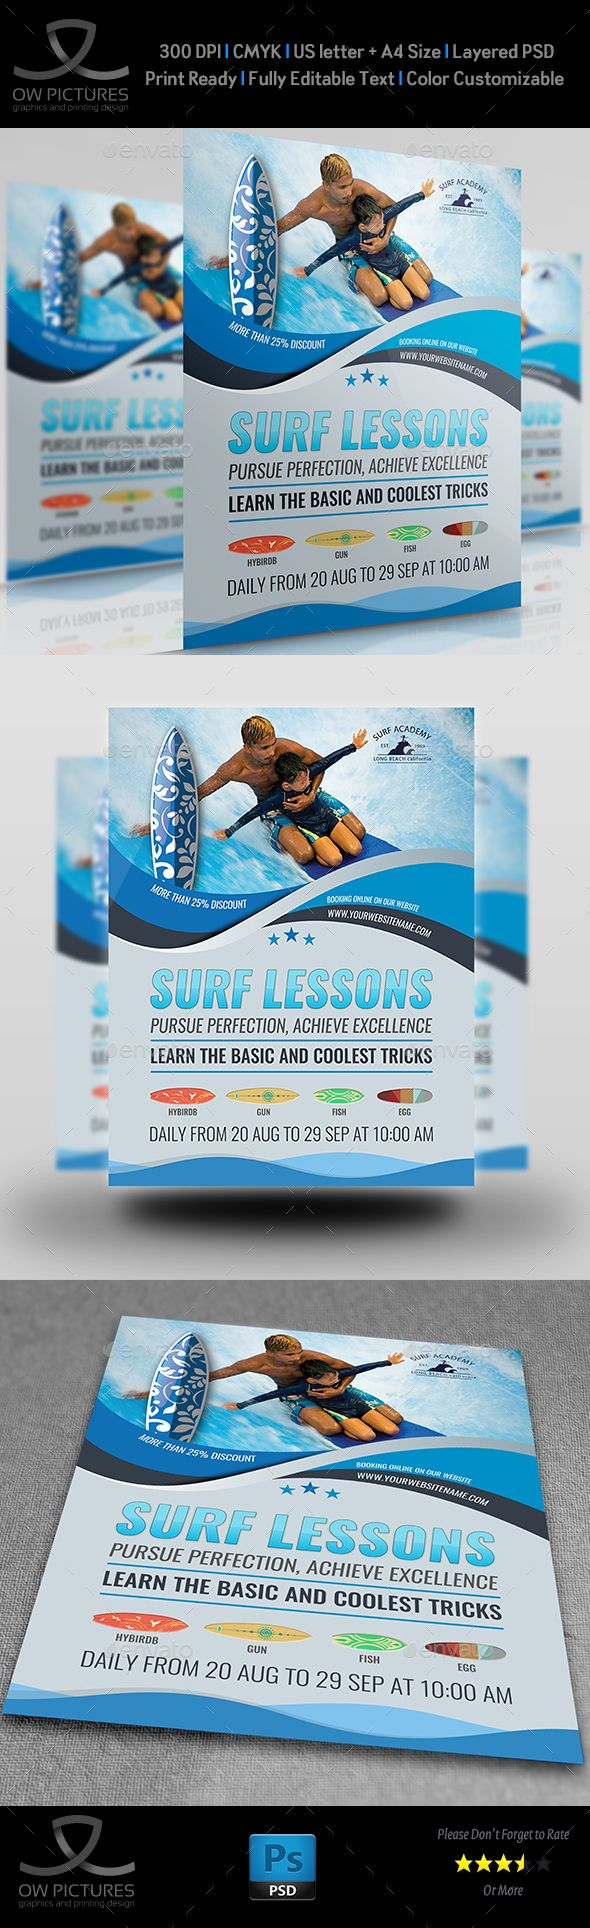 Surf Training Flyer Template PSD